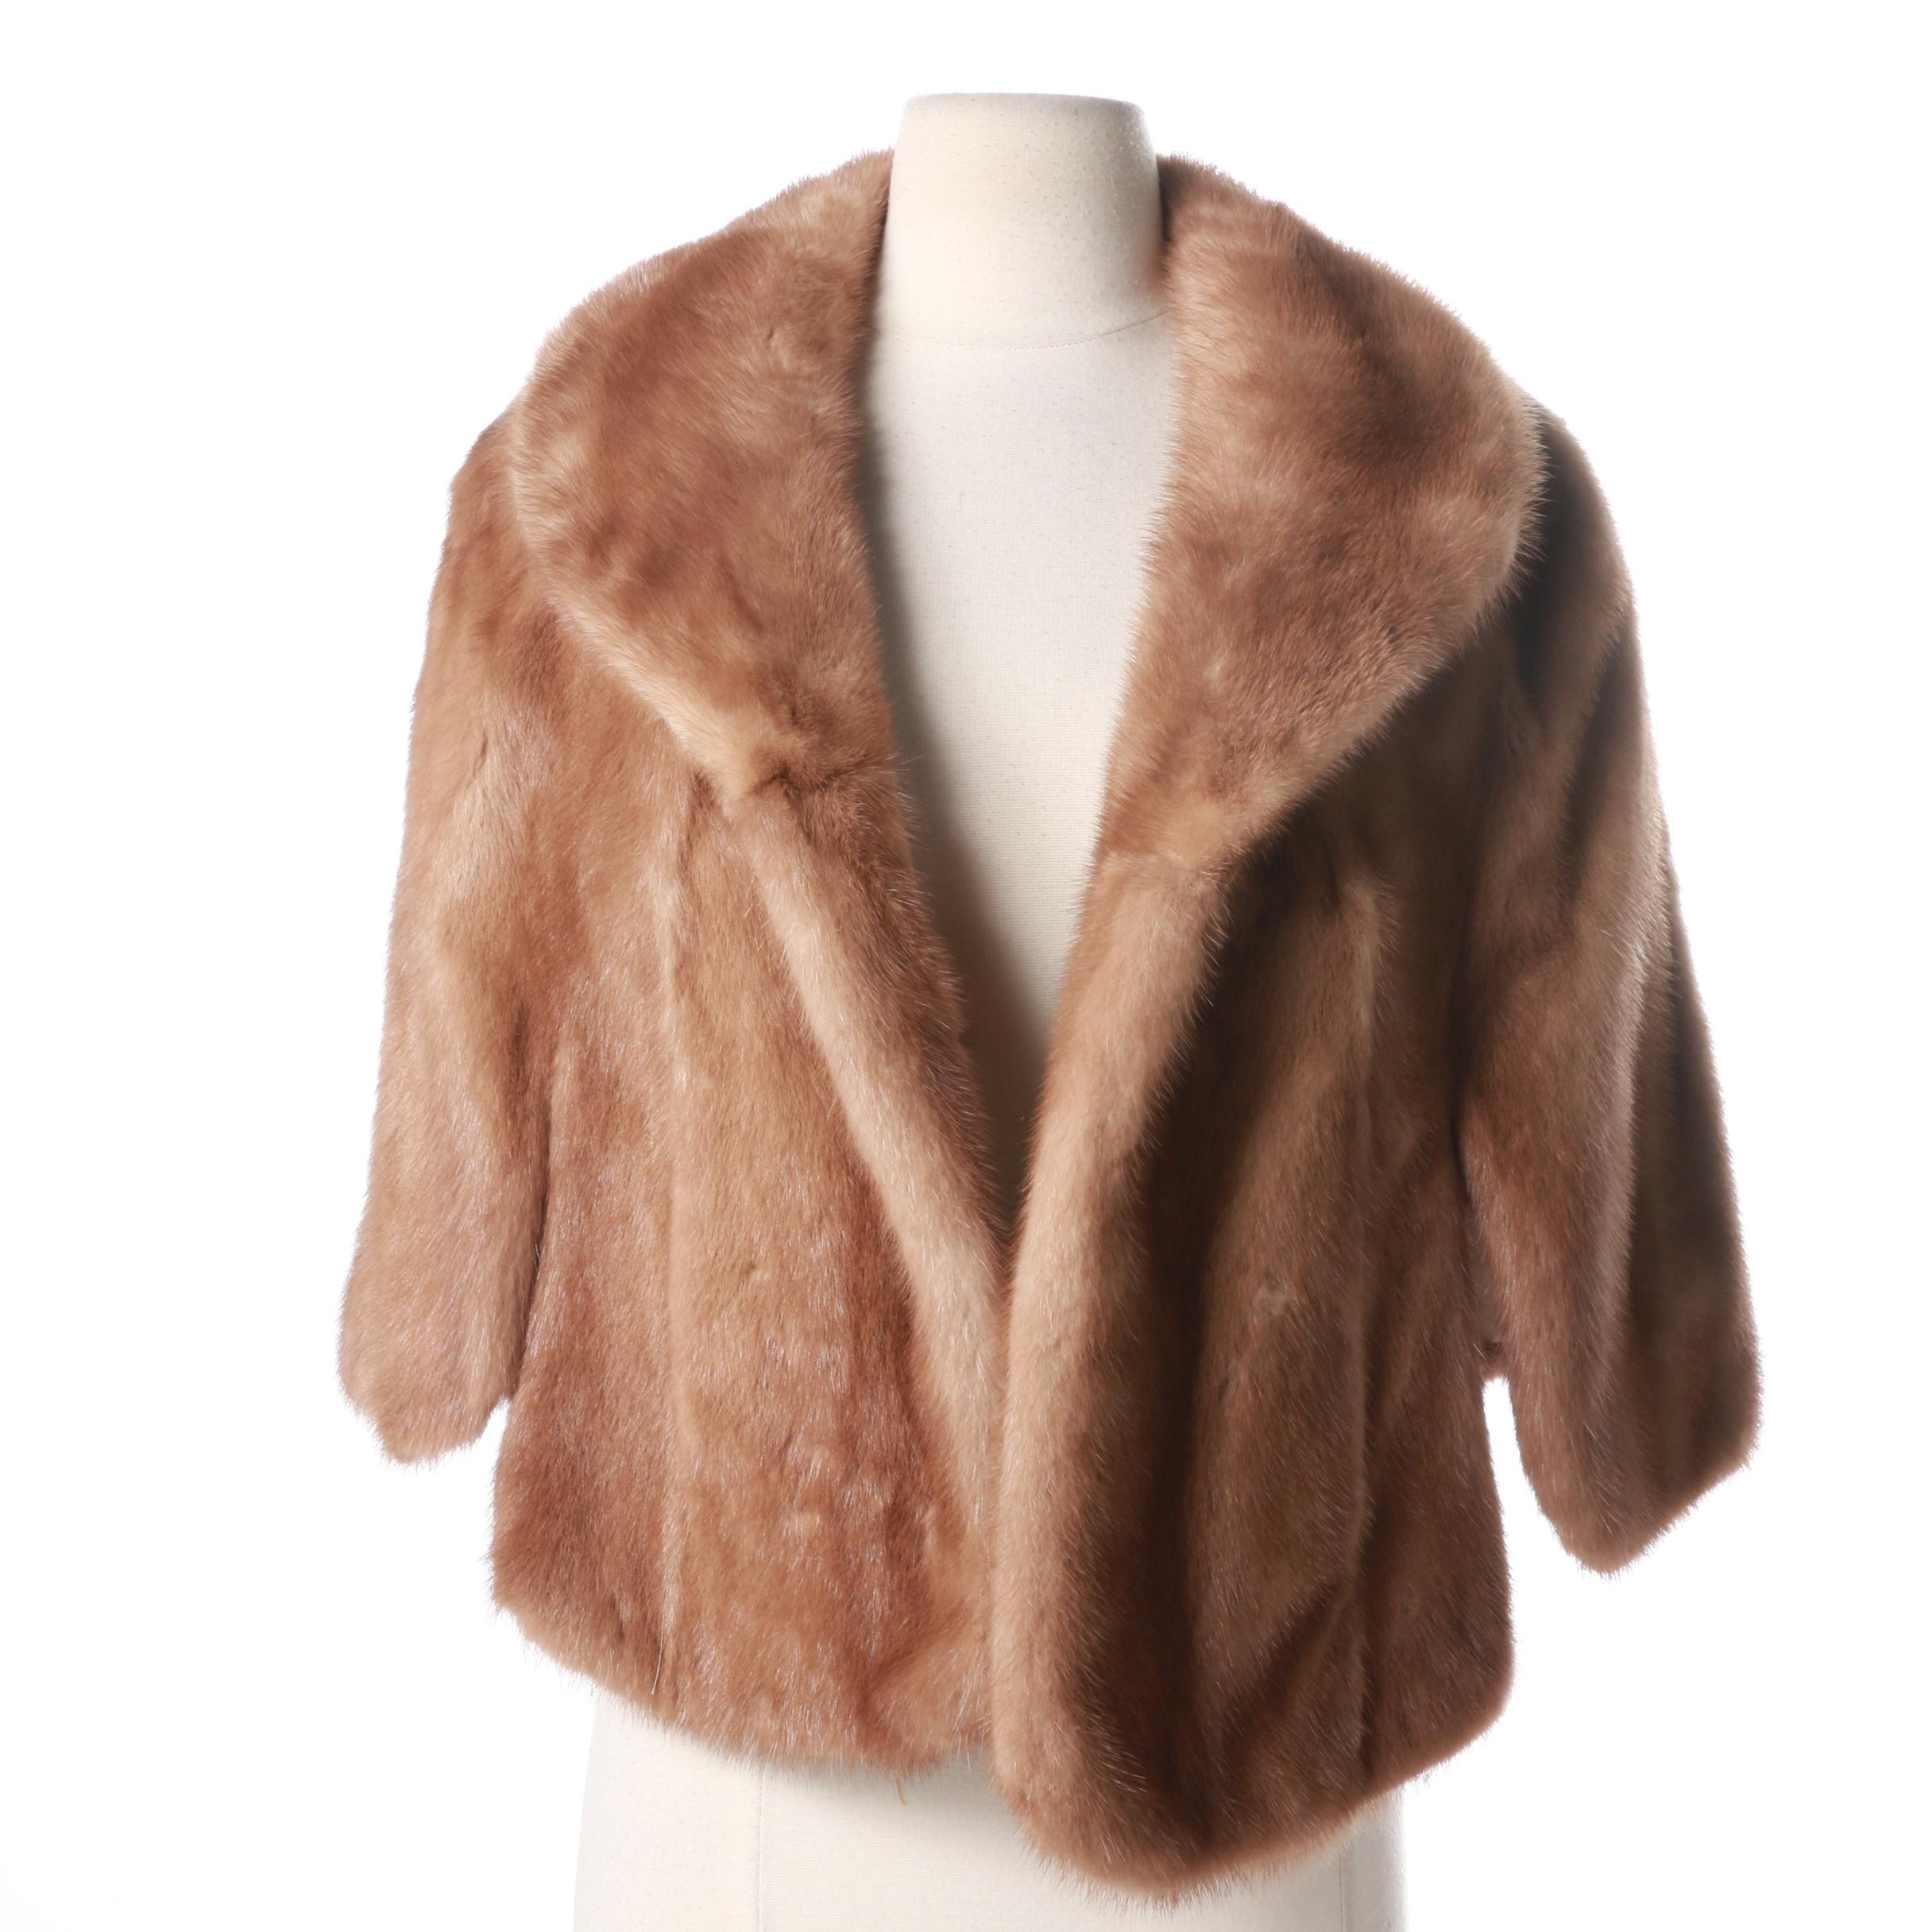 Vintage Shillito's Fur Salon Mink Jacket